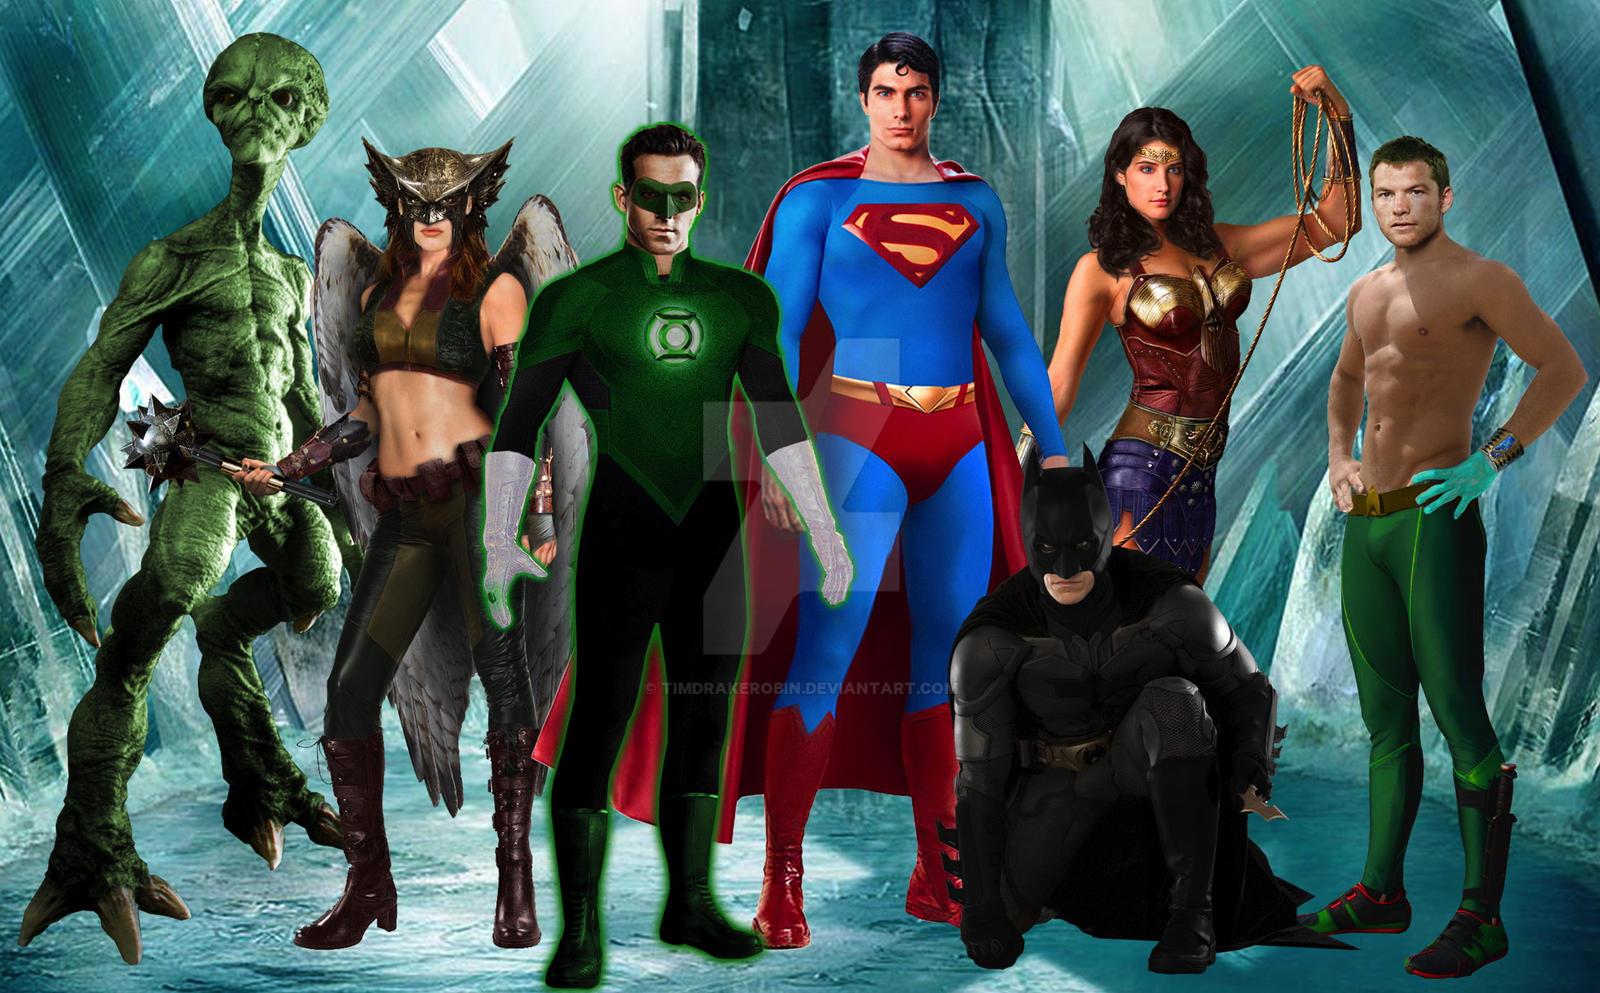 Justice League Movie Manip WIP